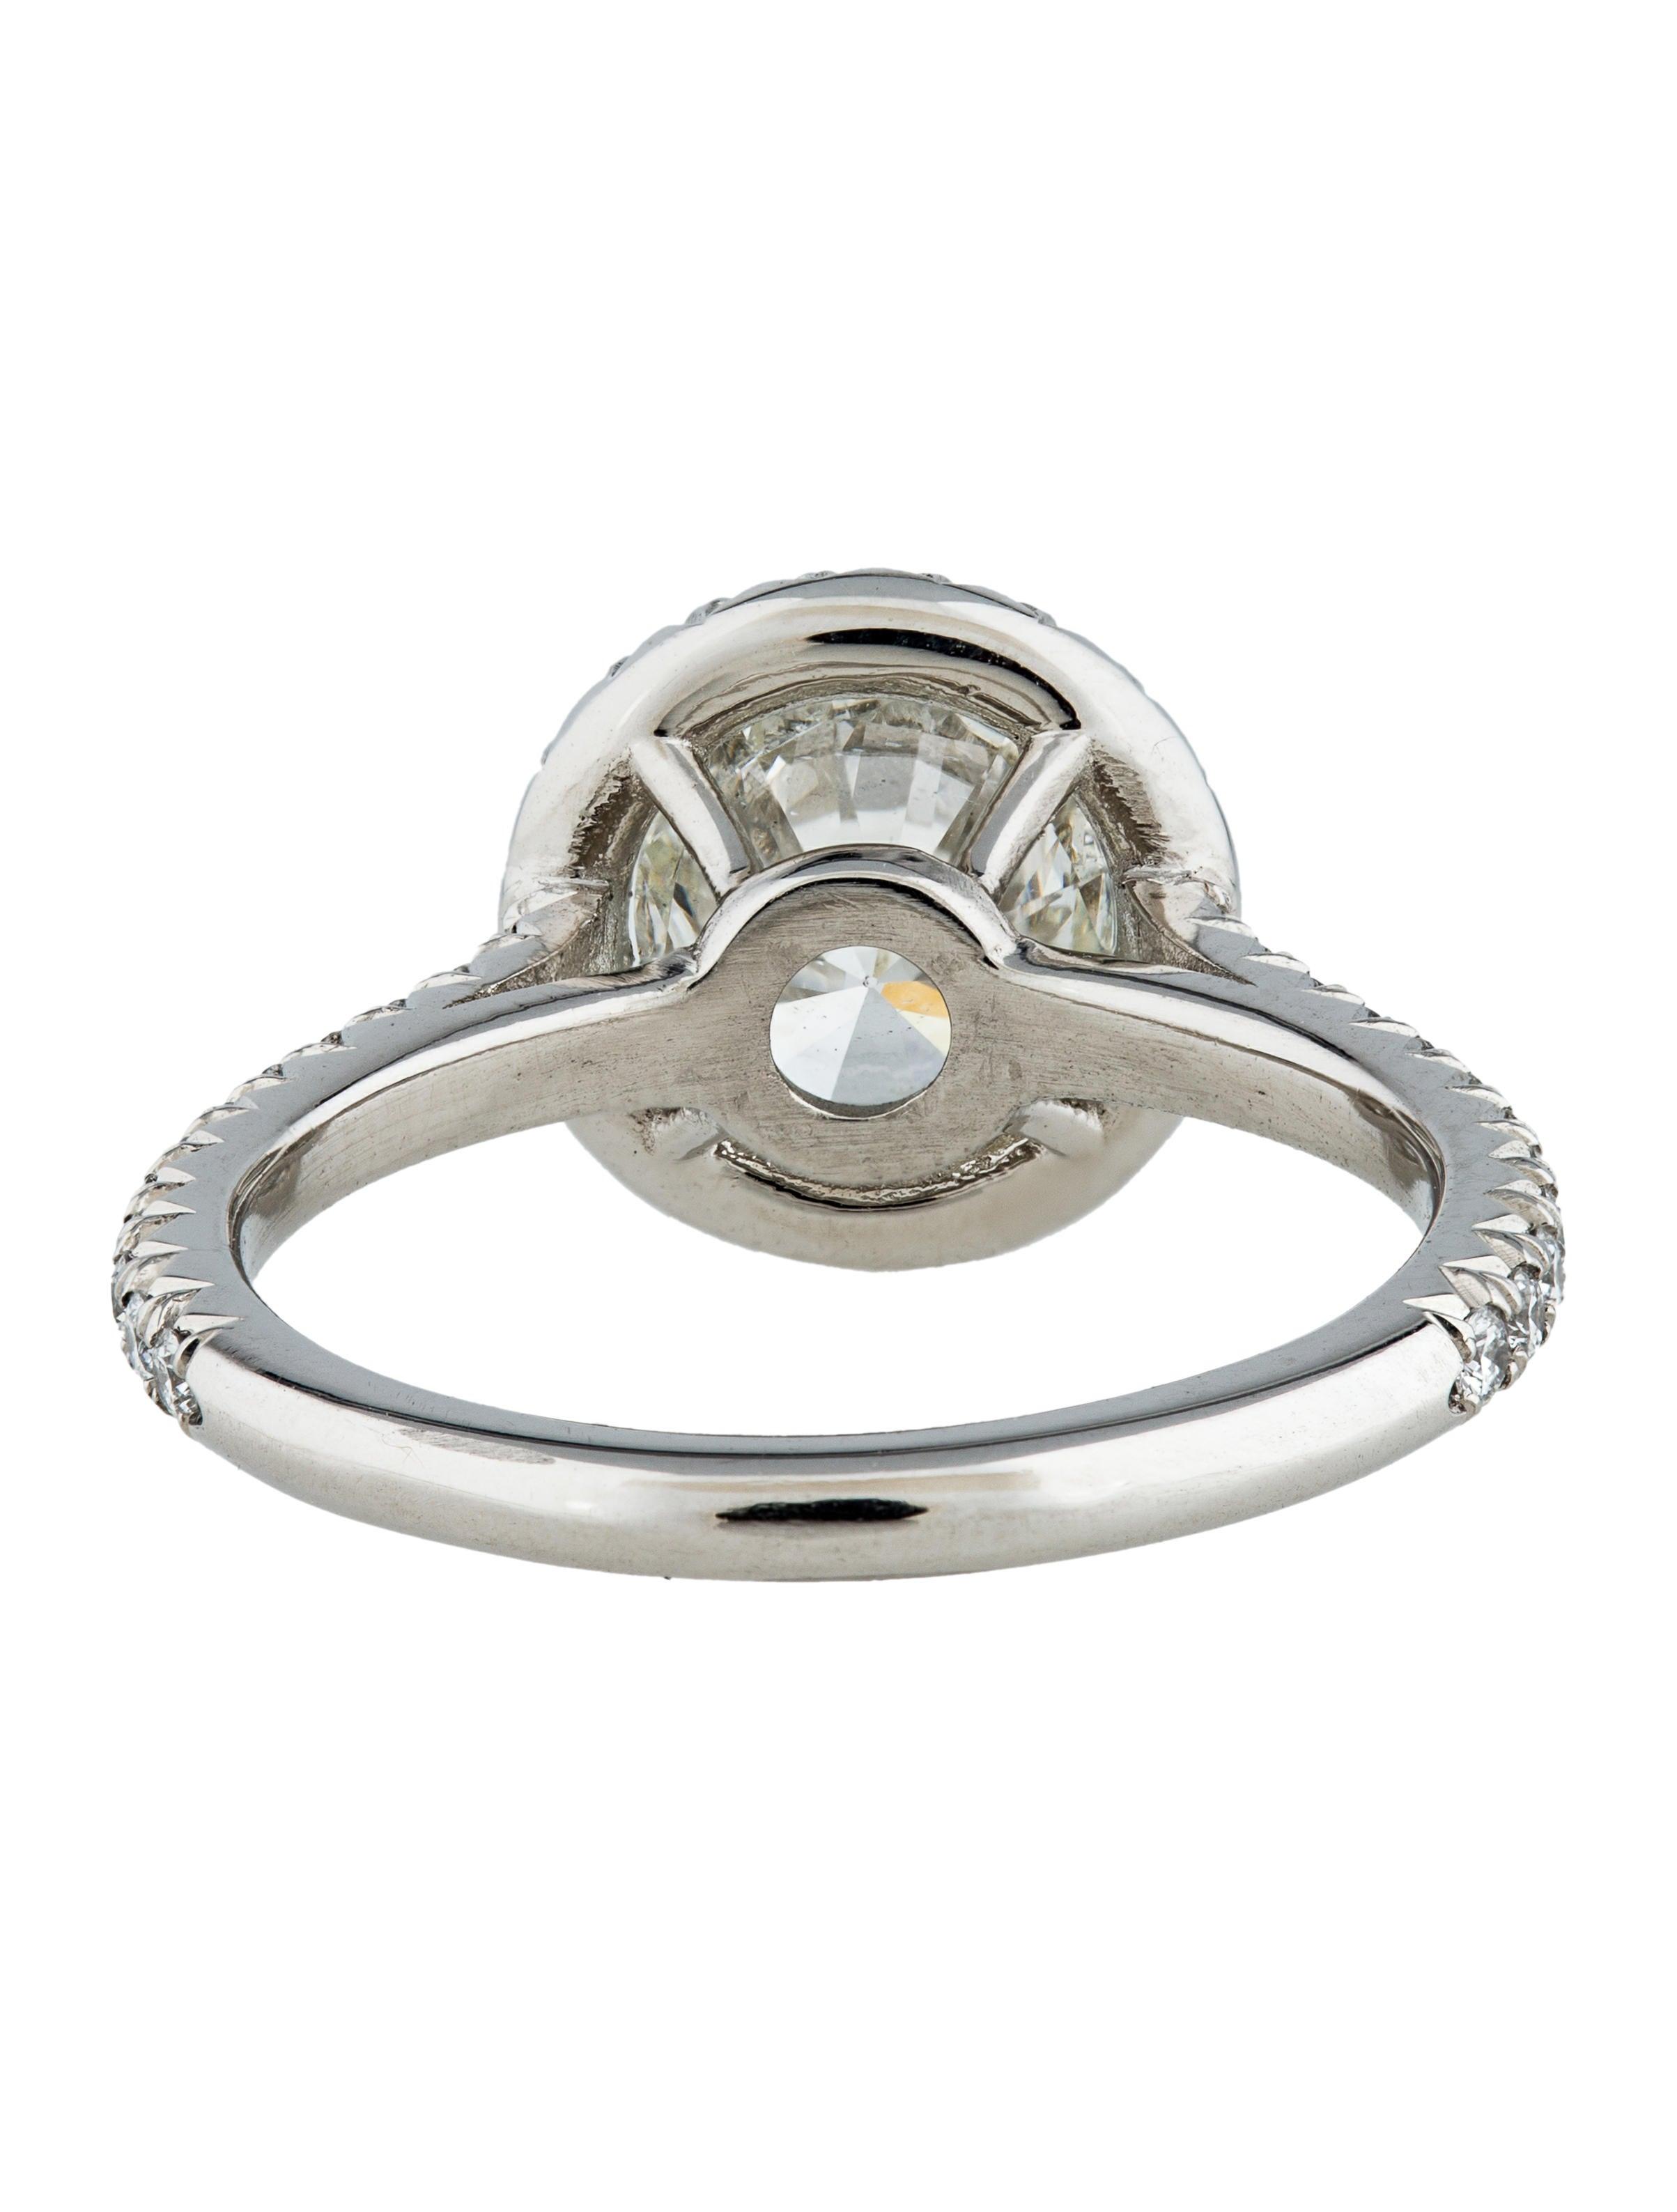 Platinum Diamond Halo Engagement Ring Rings FJR